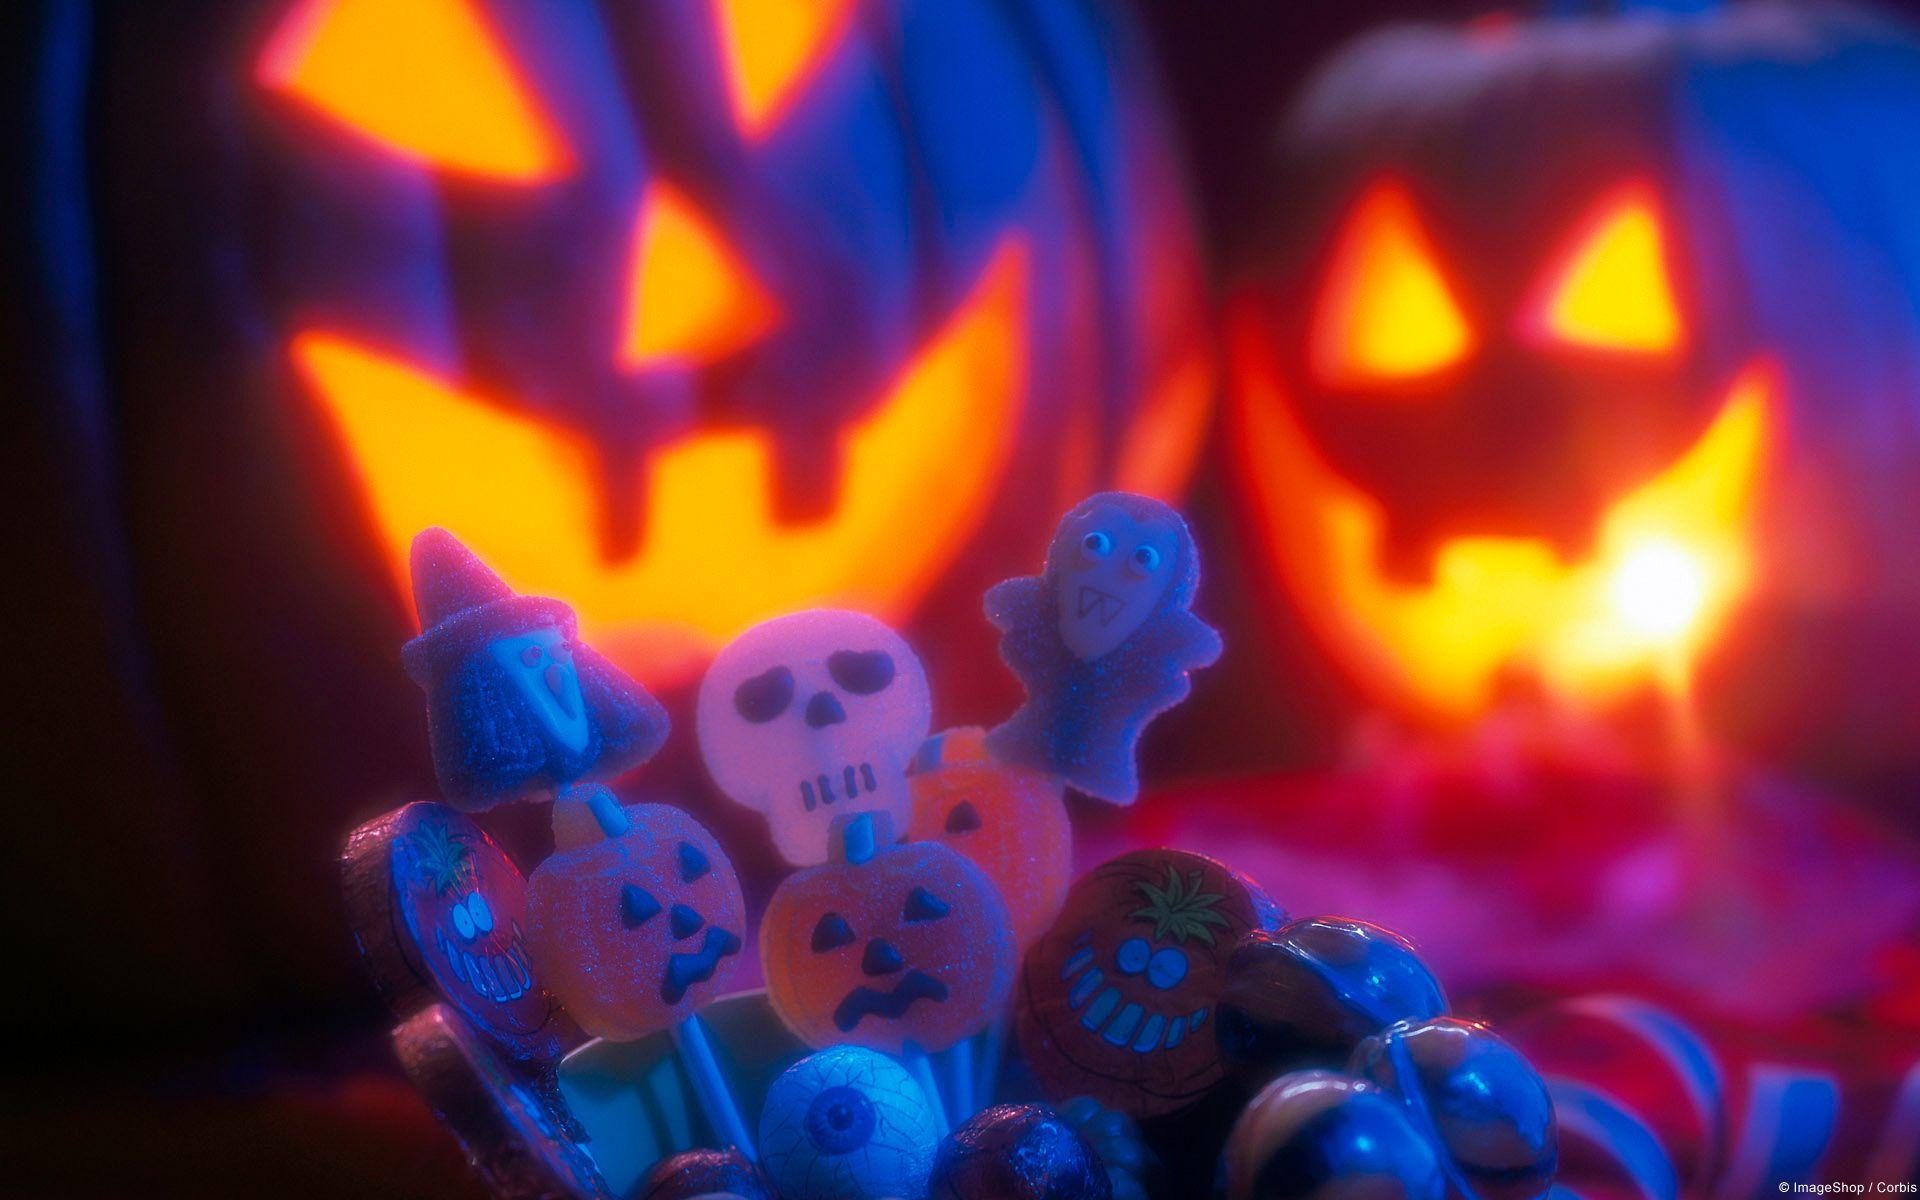 Downloads For Windows Windows Help Halloween Wallpaper Free Halloween Wallpaper Halloween Desktop Wallpaper